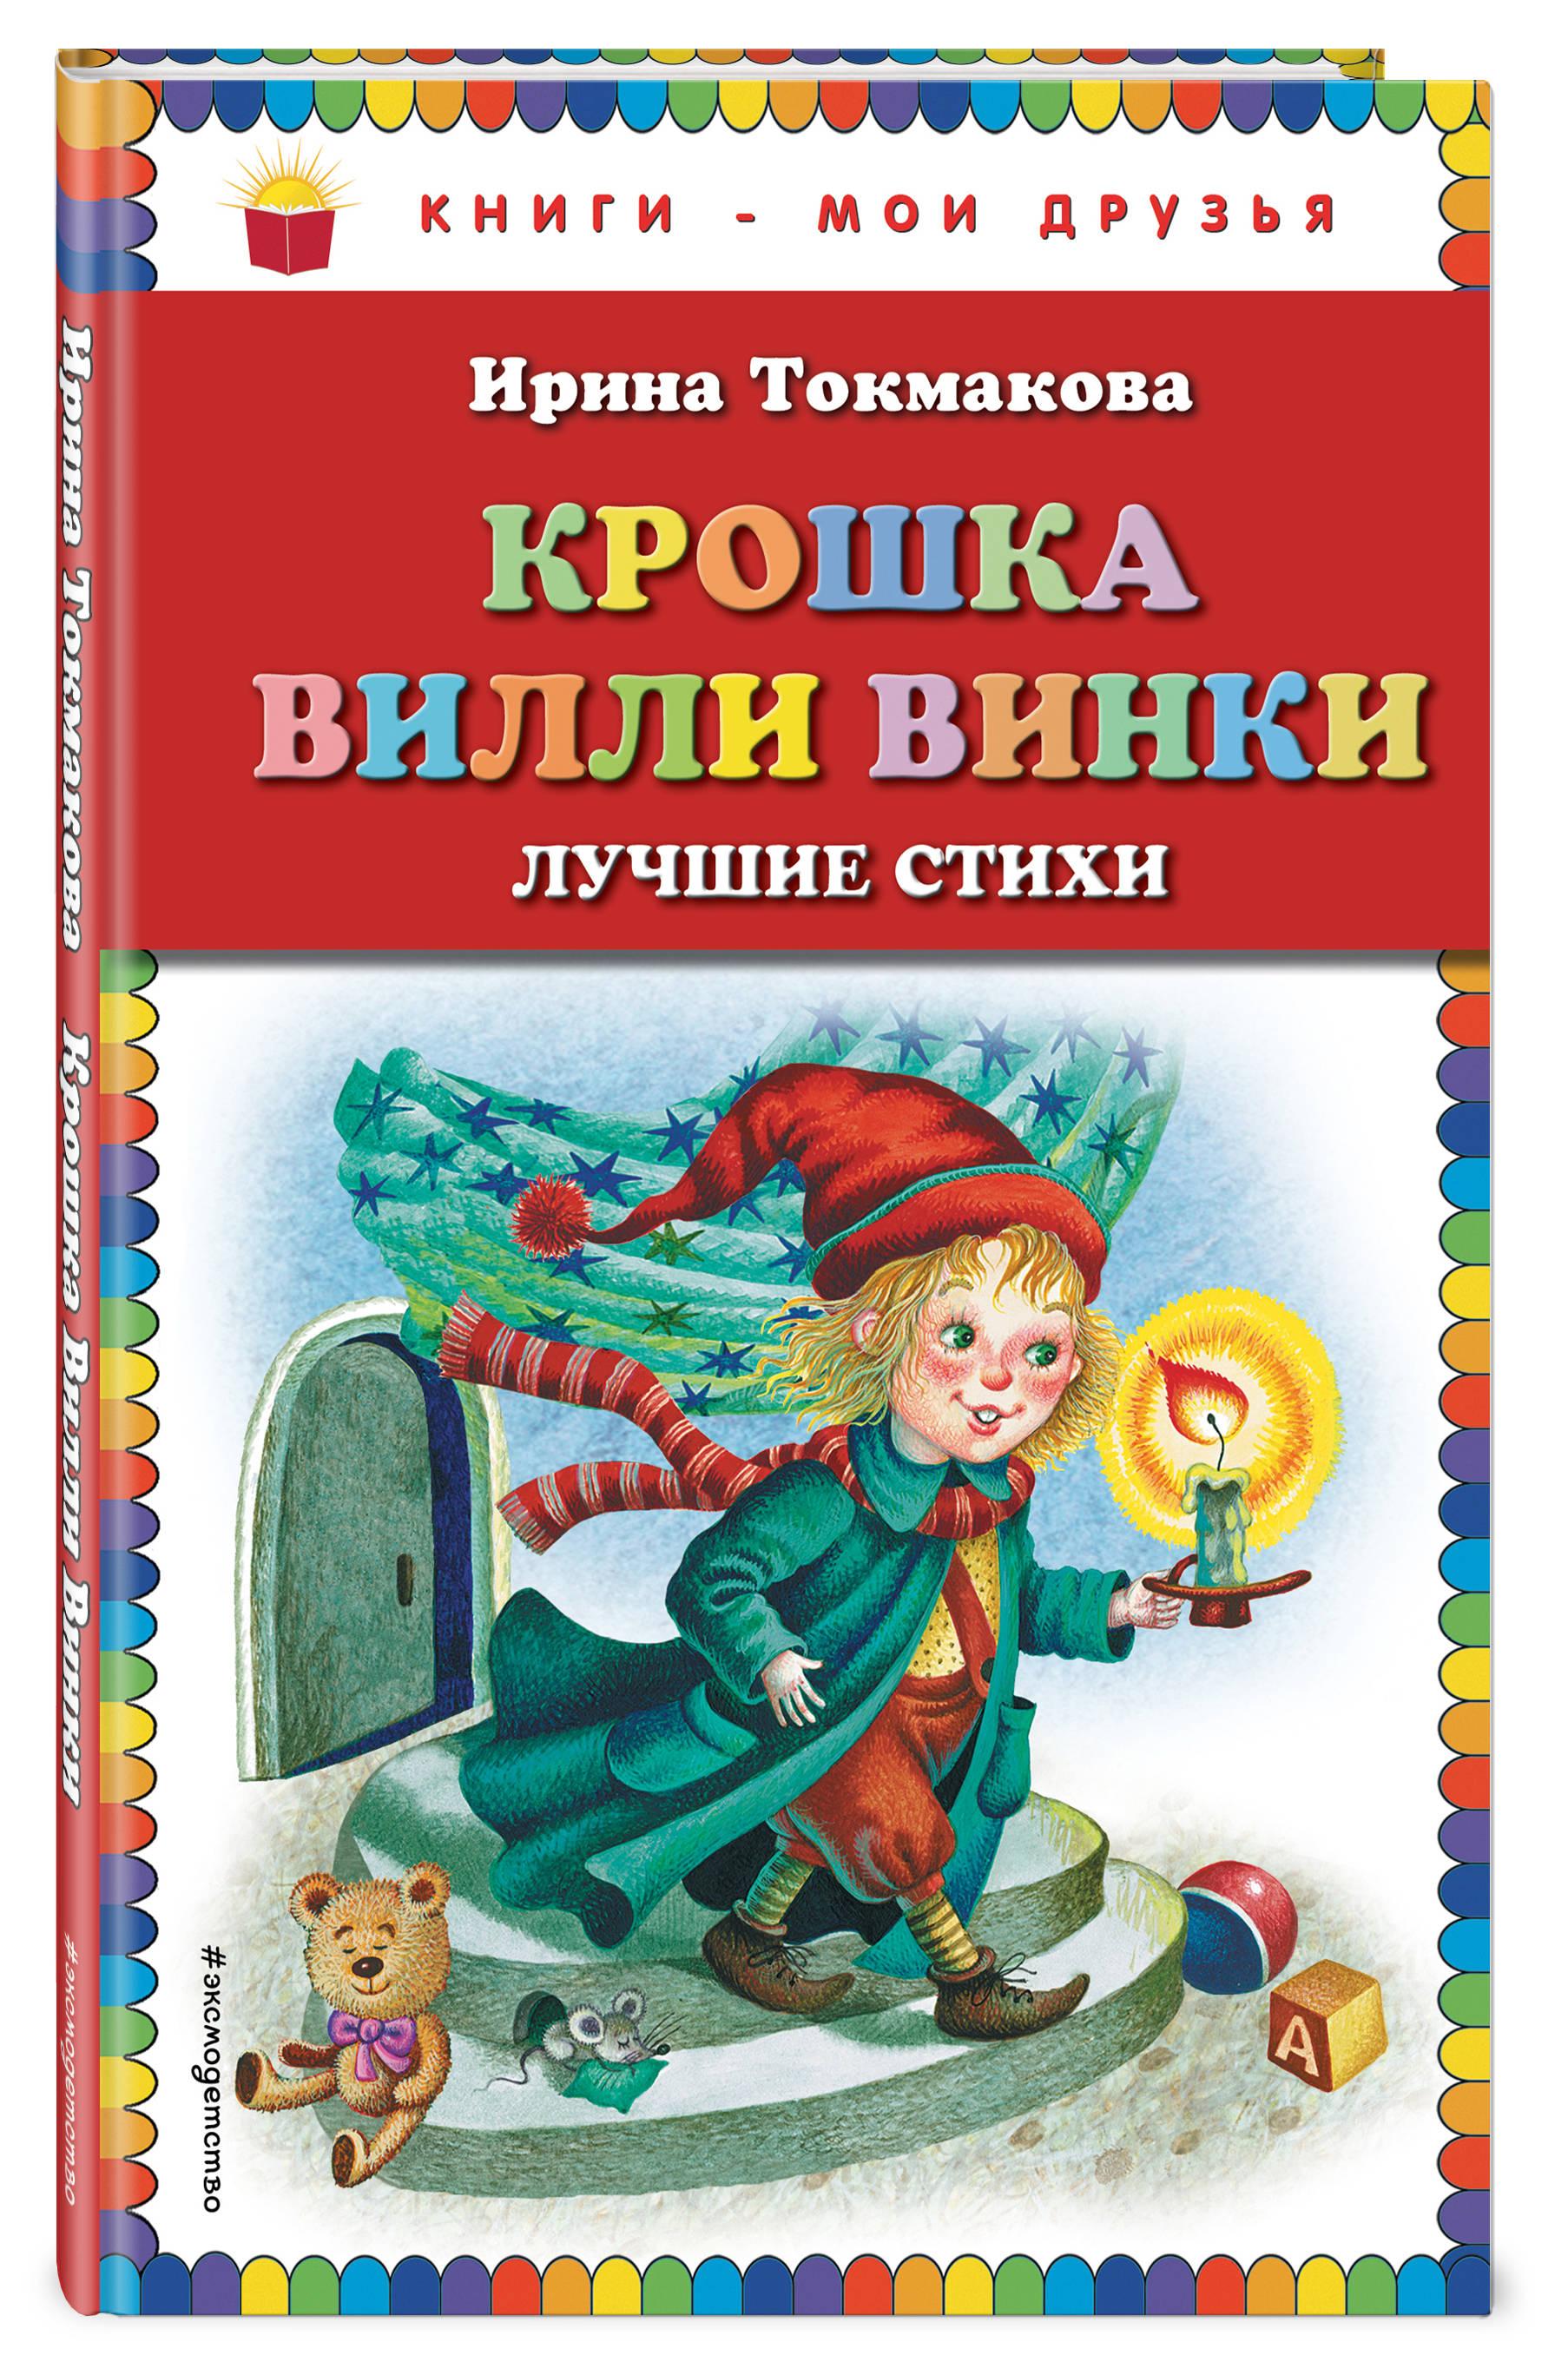 Ирина Токмакова Крошка Вилли Винки. Лучшие стихи пазлы larsen пазл тигр